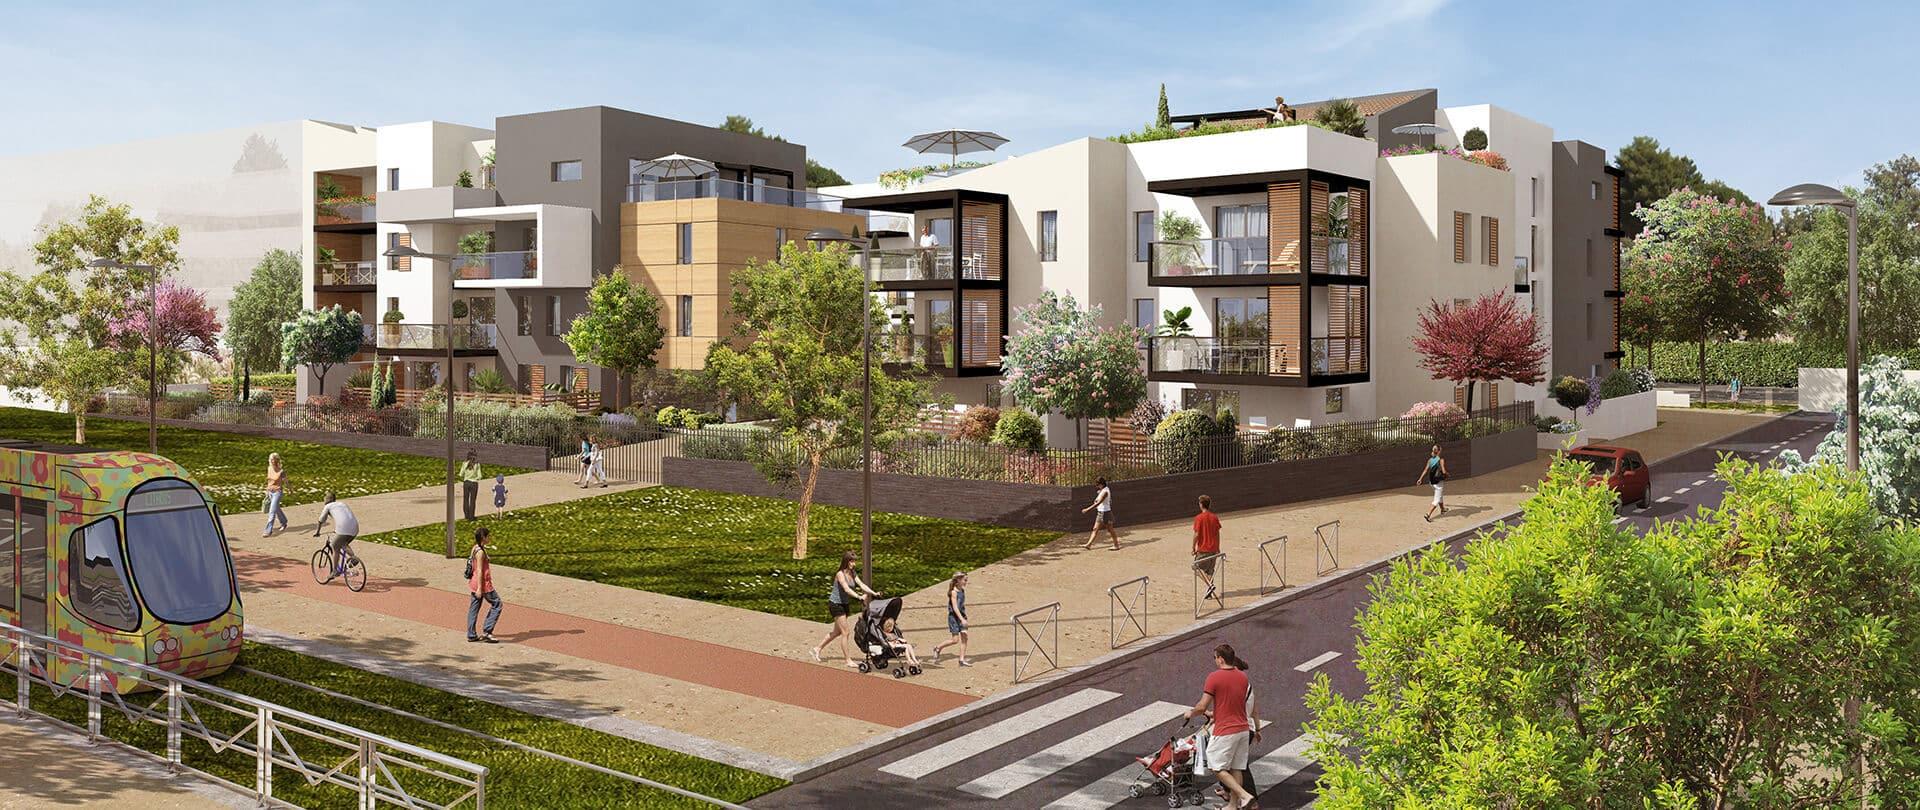 projet immobilier green village à Montpellier